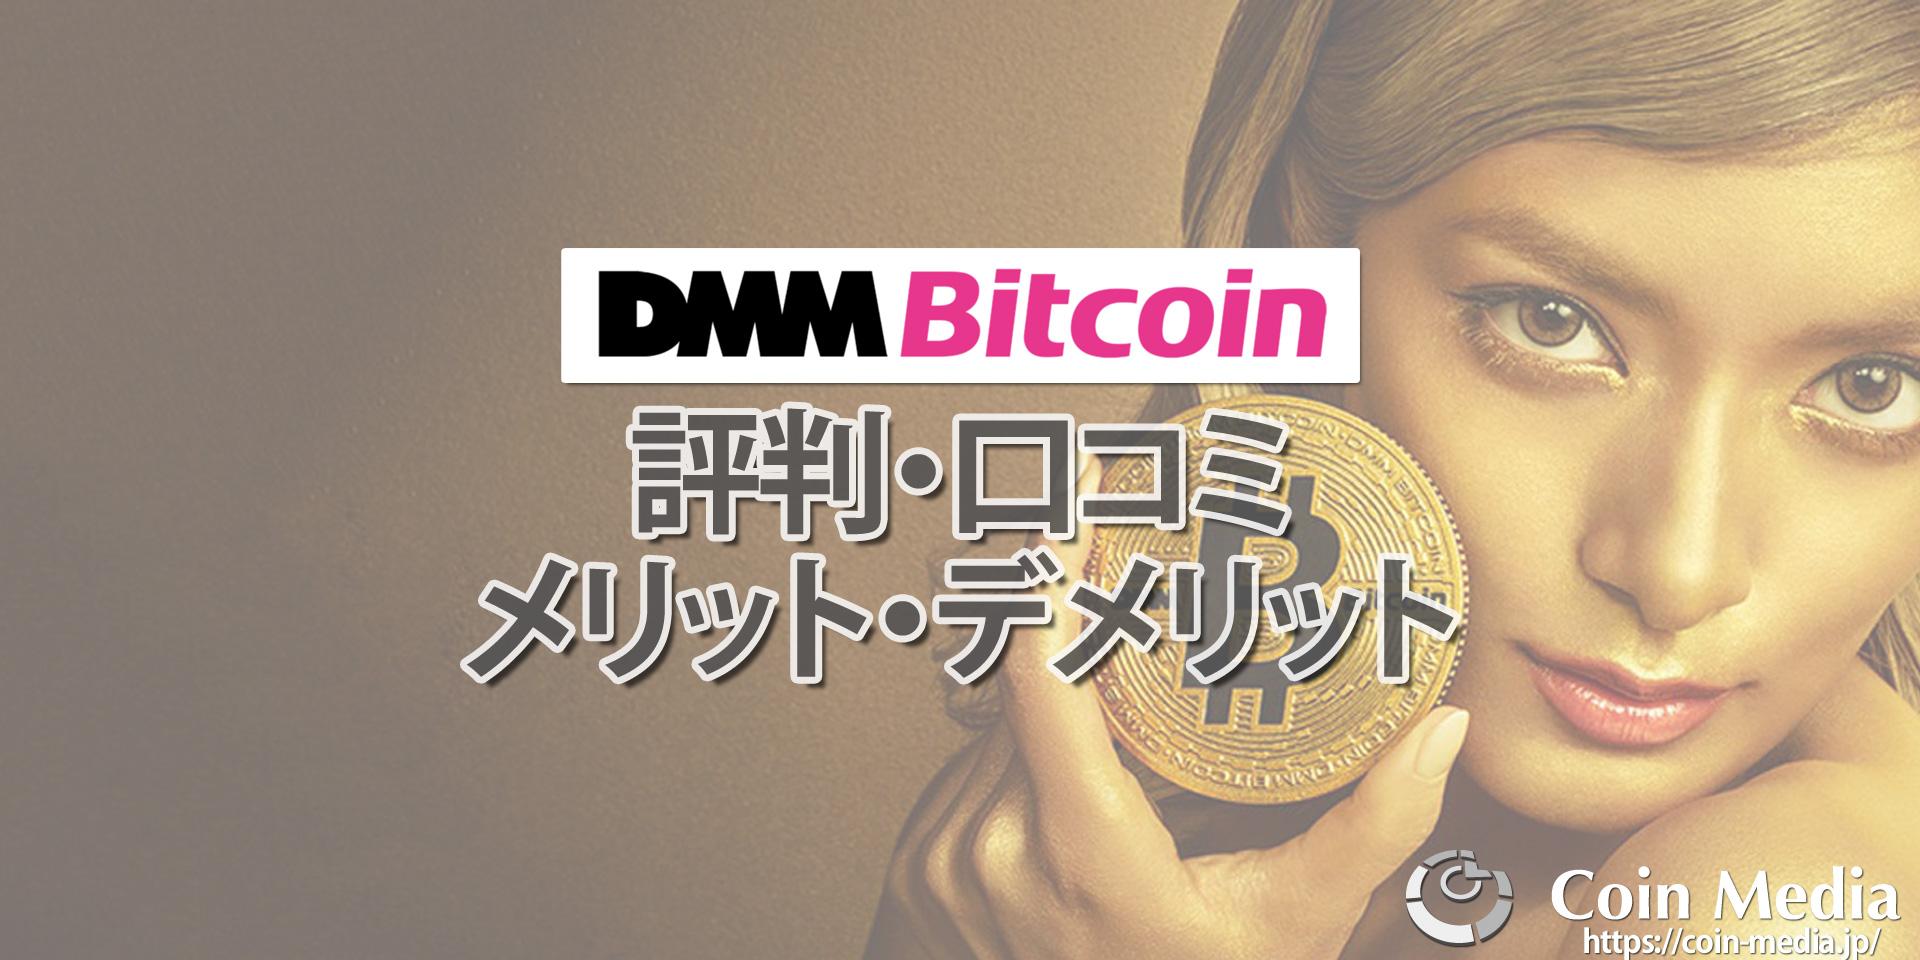 DMMビットコイン評判、口コミ、メリット、デメリット